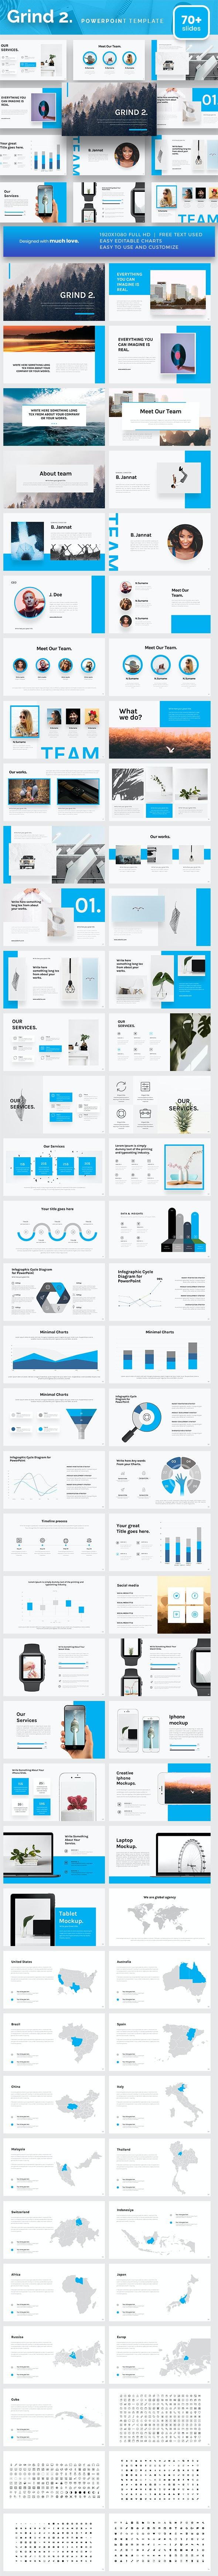 Grind 2 Powerpoint Presentation Template - PowerPoint Templates Presentation Templates